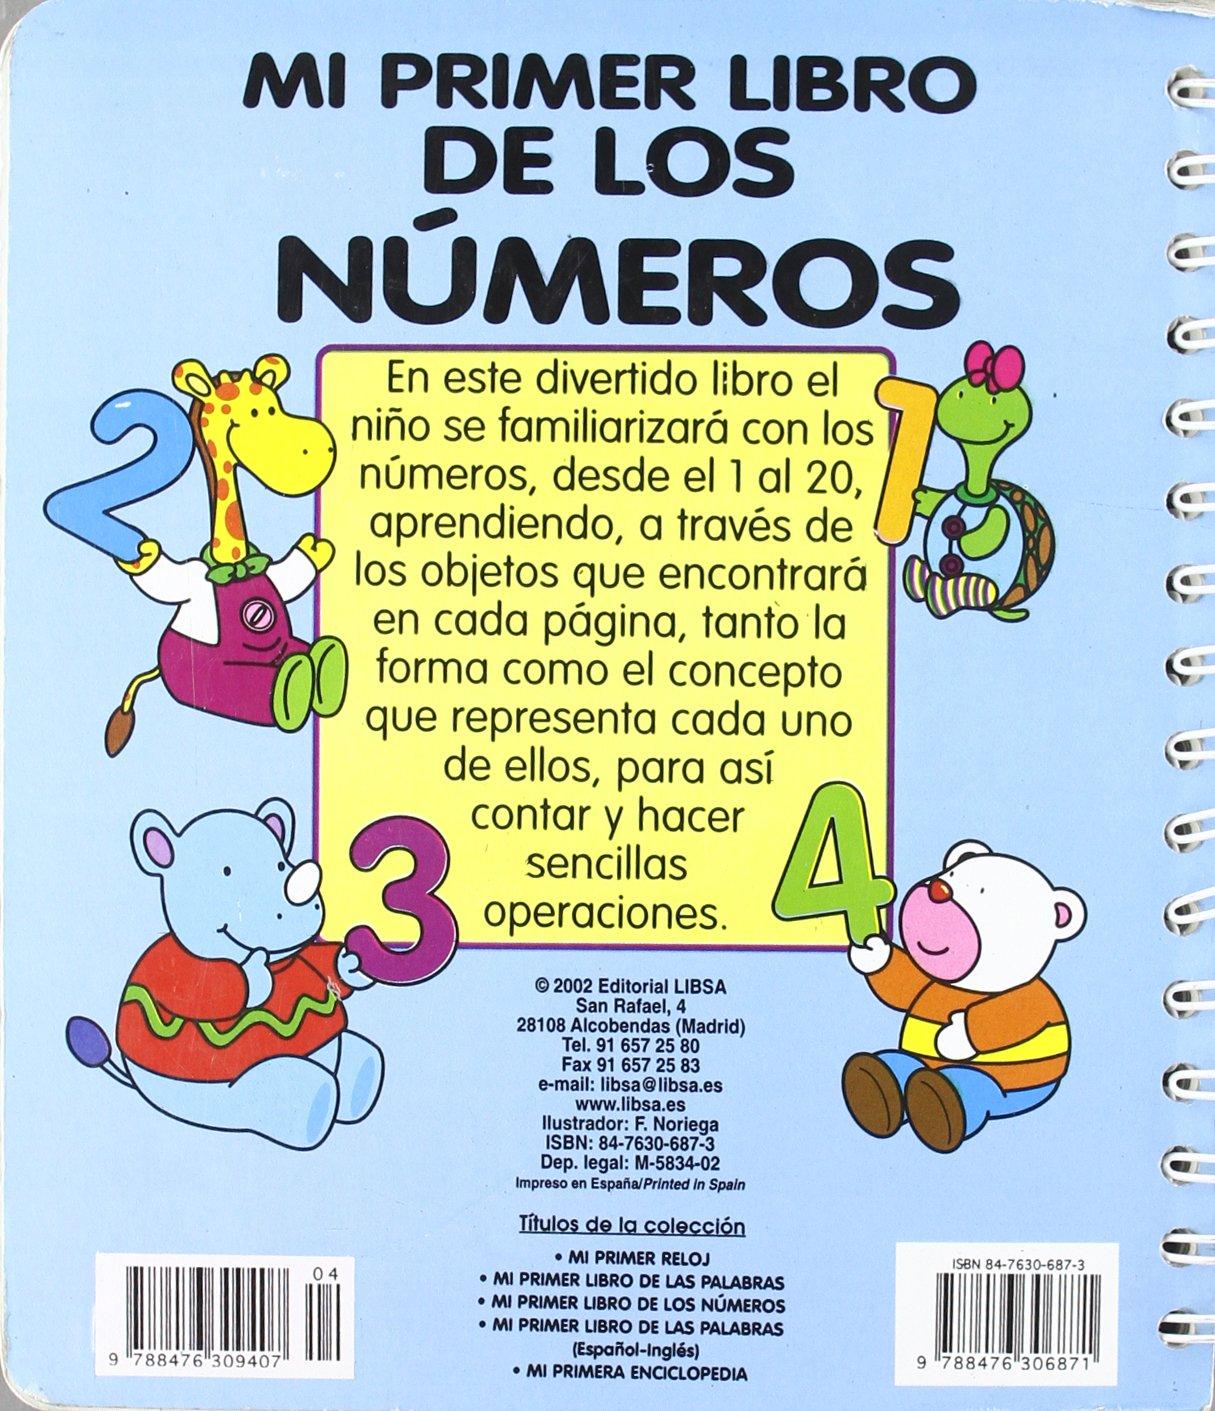 Amazon.com: Mi Primer Libro de Los Numeros (Spanish Edition) (9788476306871): Libsa: Books